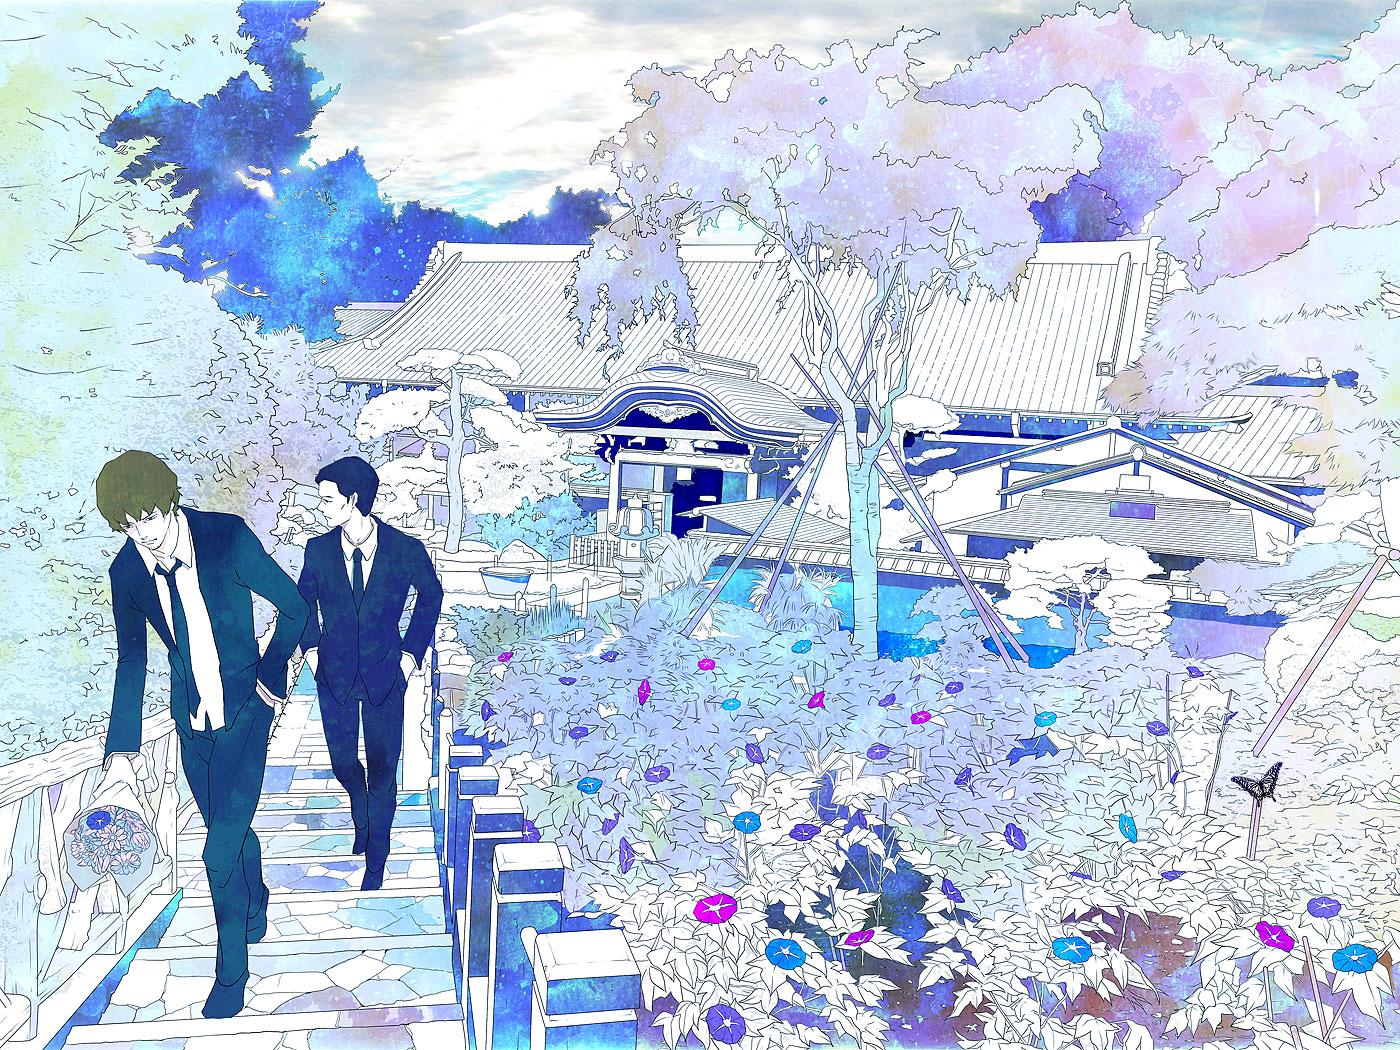 Zootopia Iphone Wallpaper Wabisuke Jinnouchi Wallpaper And Background Image